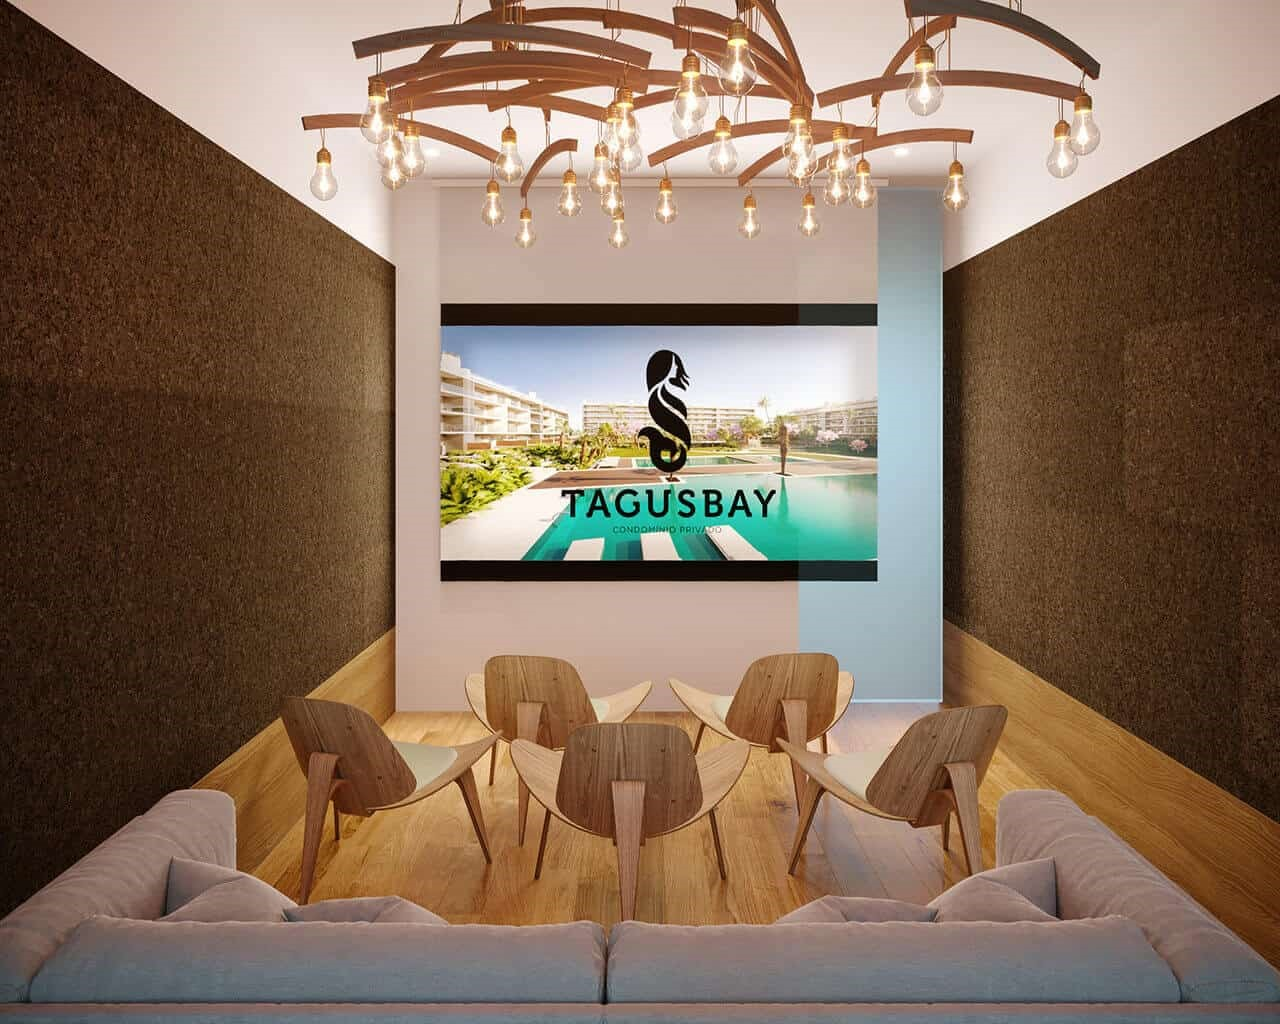 Tagus Bay-Media rum